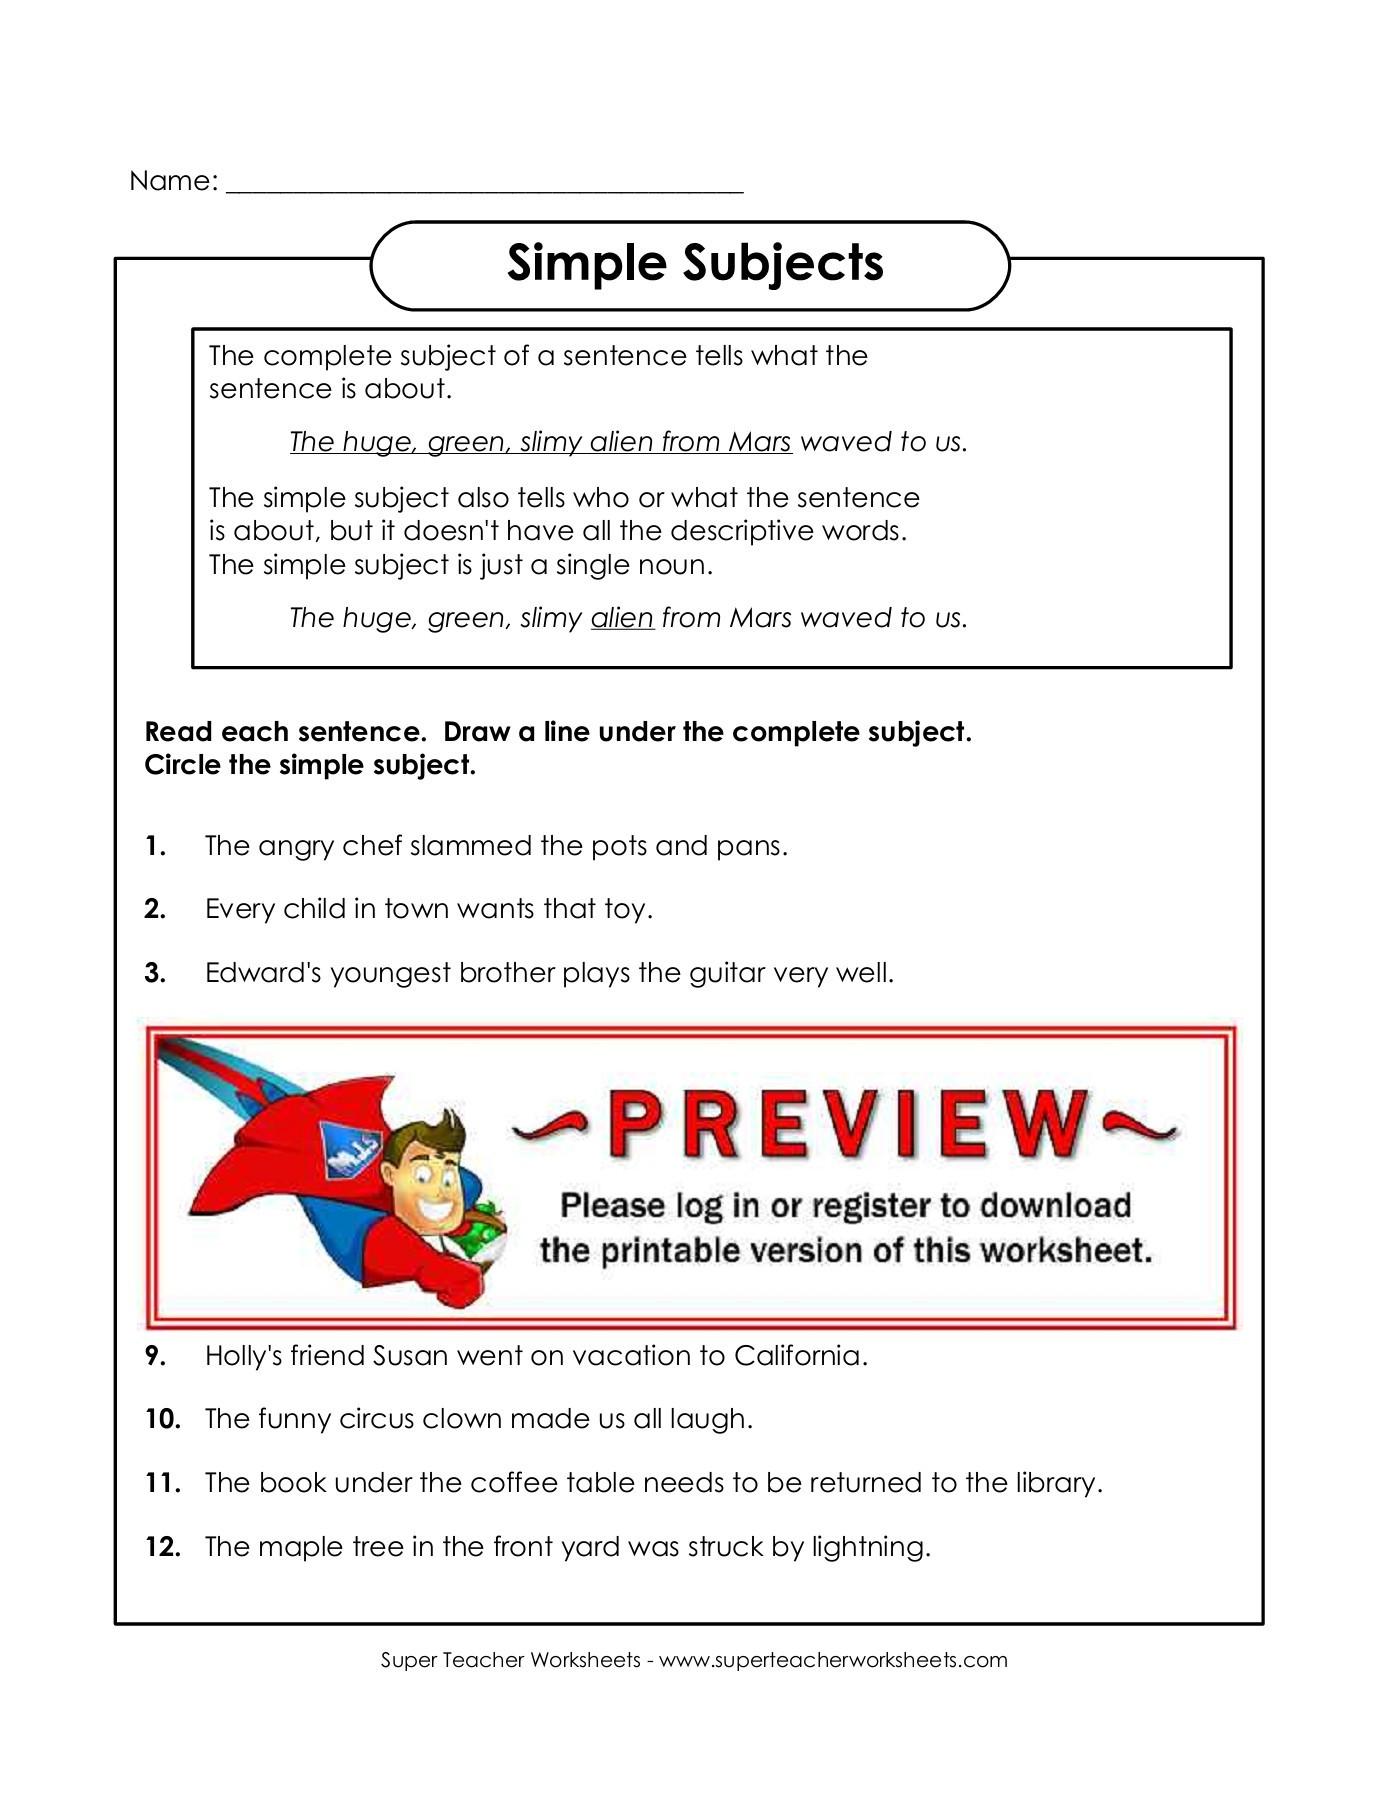 Super Teacher Worksheets Answer